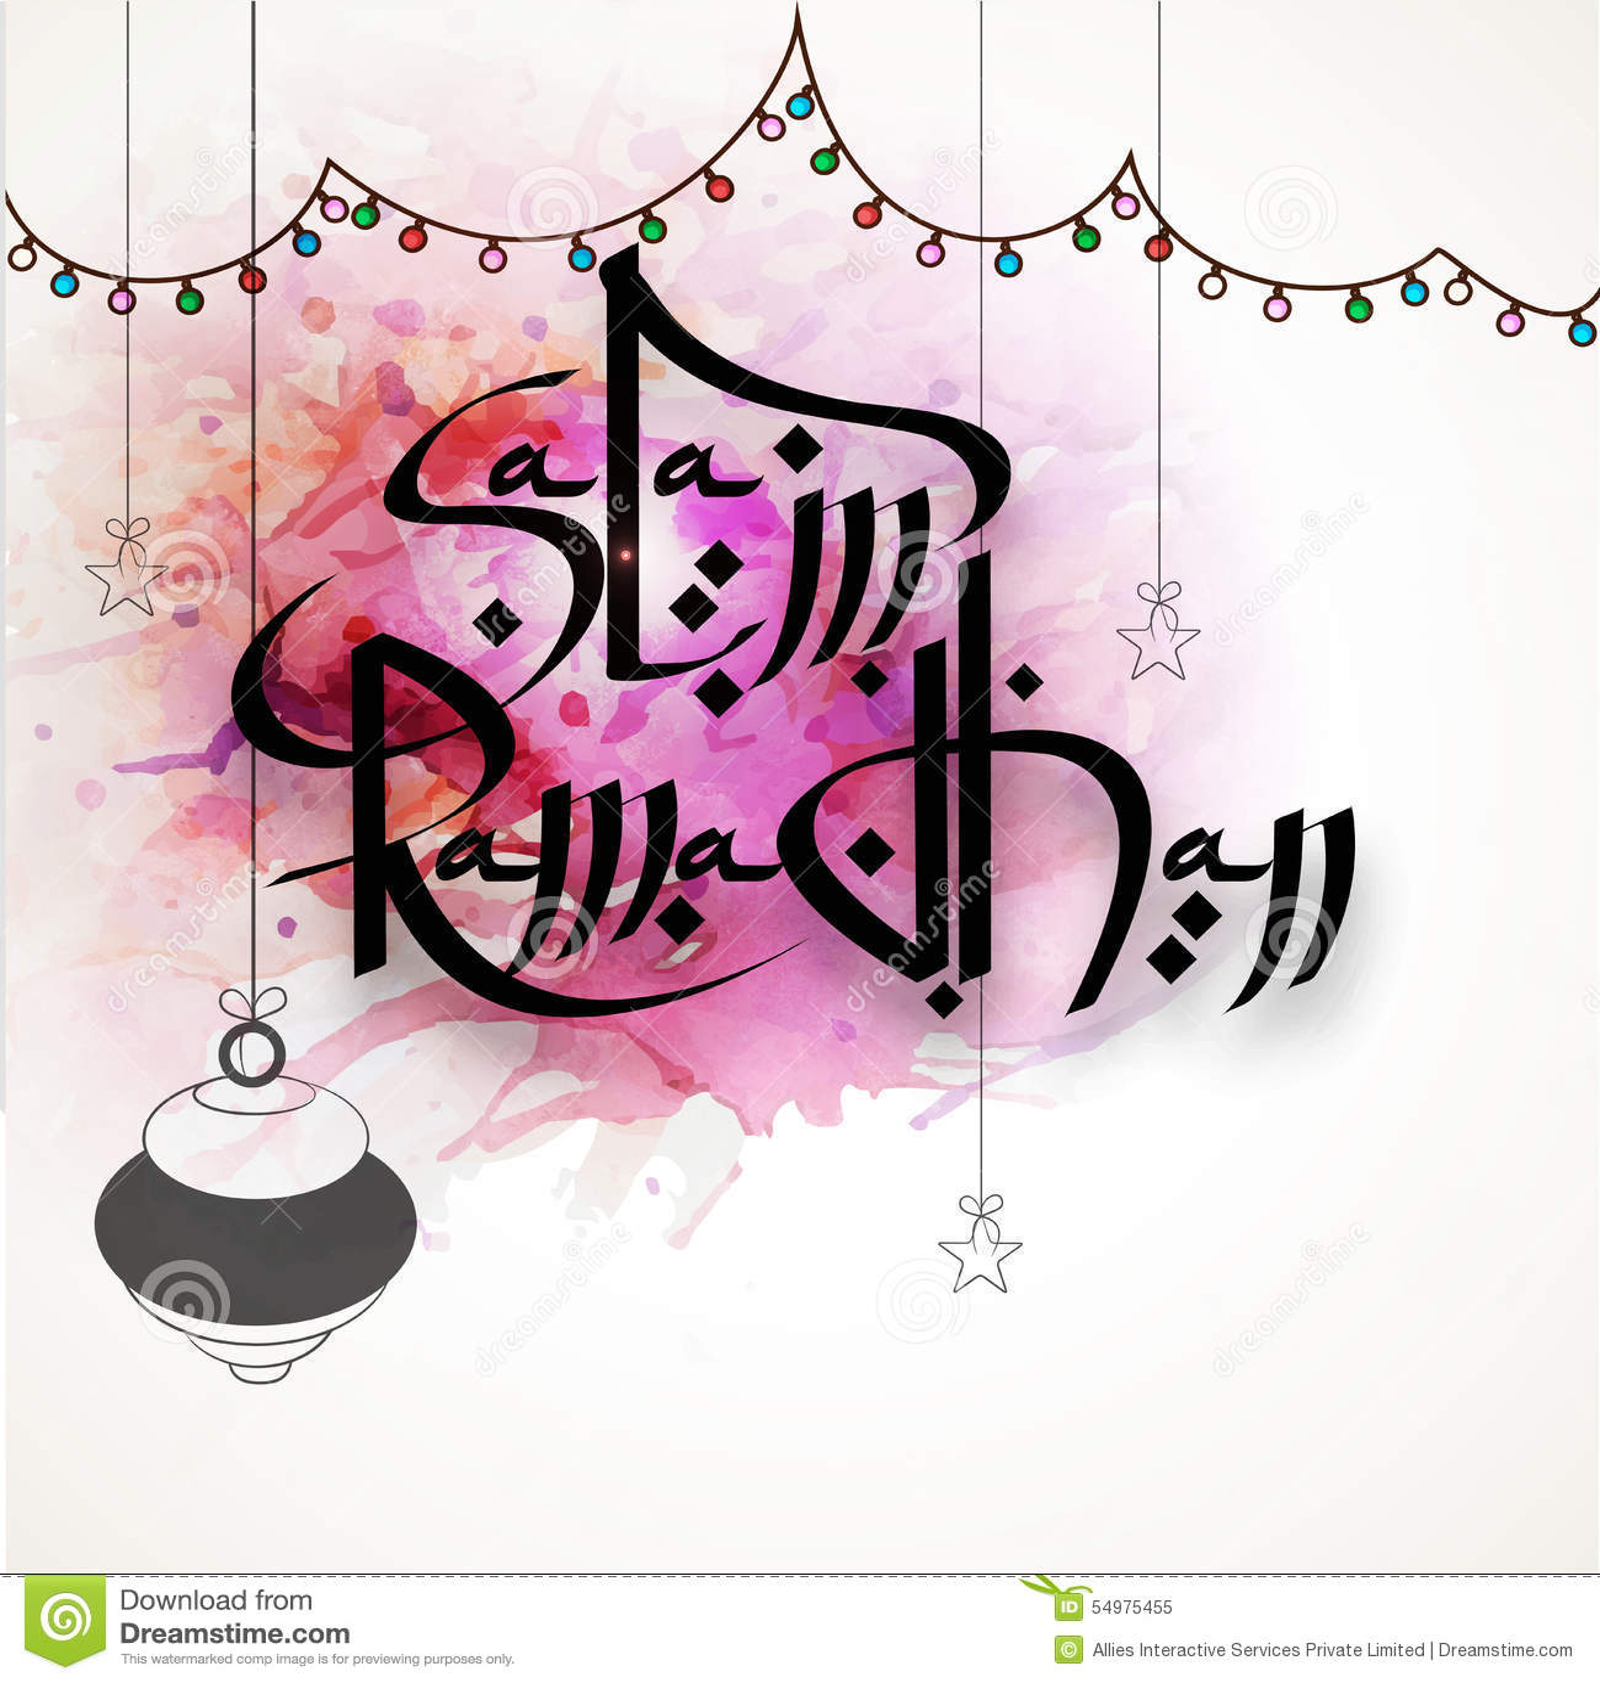 Greeting card for ramadan kareem celebration stock illustration download greeting card for ramadan kareem celebration stock illustration illustration of islam beautiful m4hsunfo